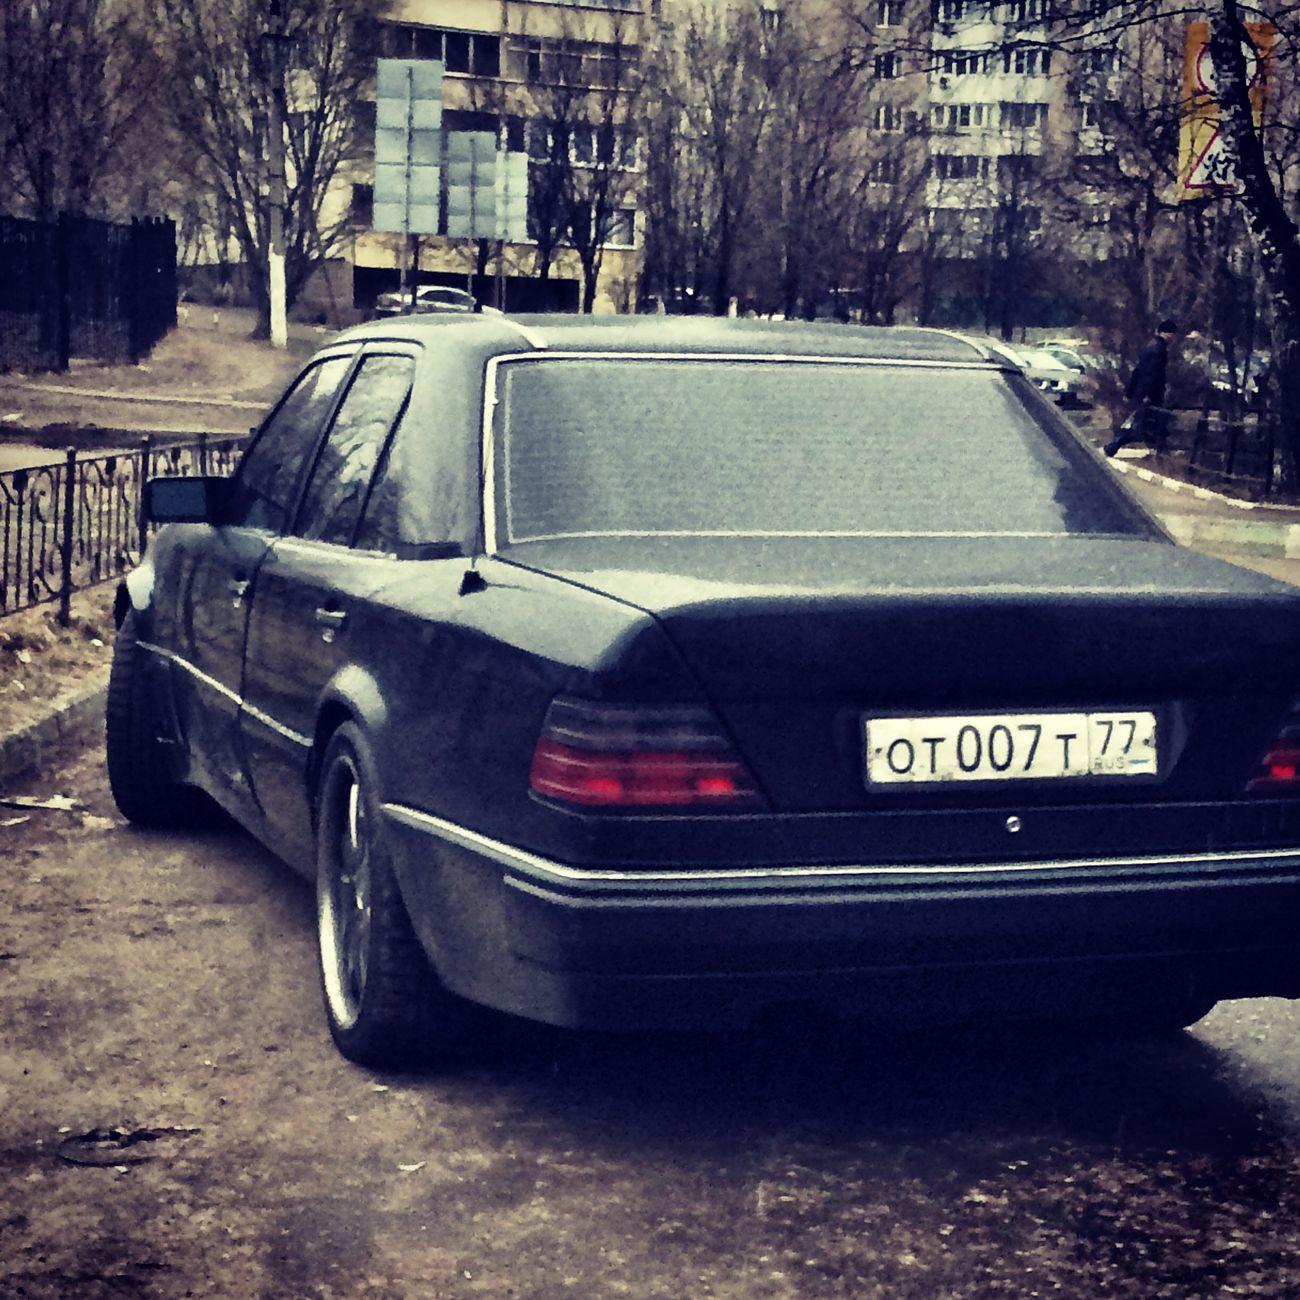 Mercedes W124 Thebestofthebest Ideal Onelove♥ Wolf Love ♥ Nature Hello World Pornoparty